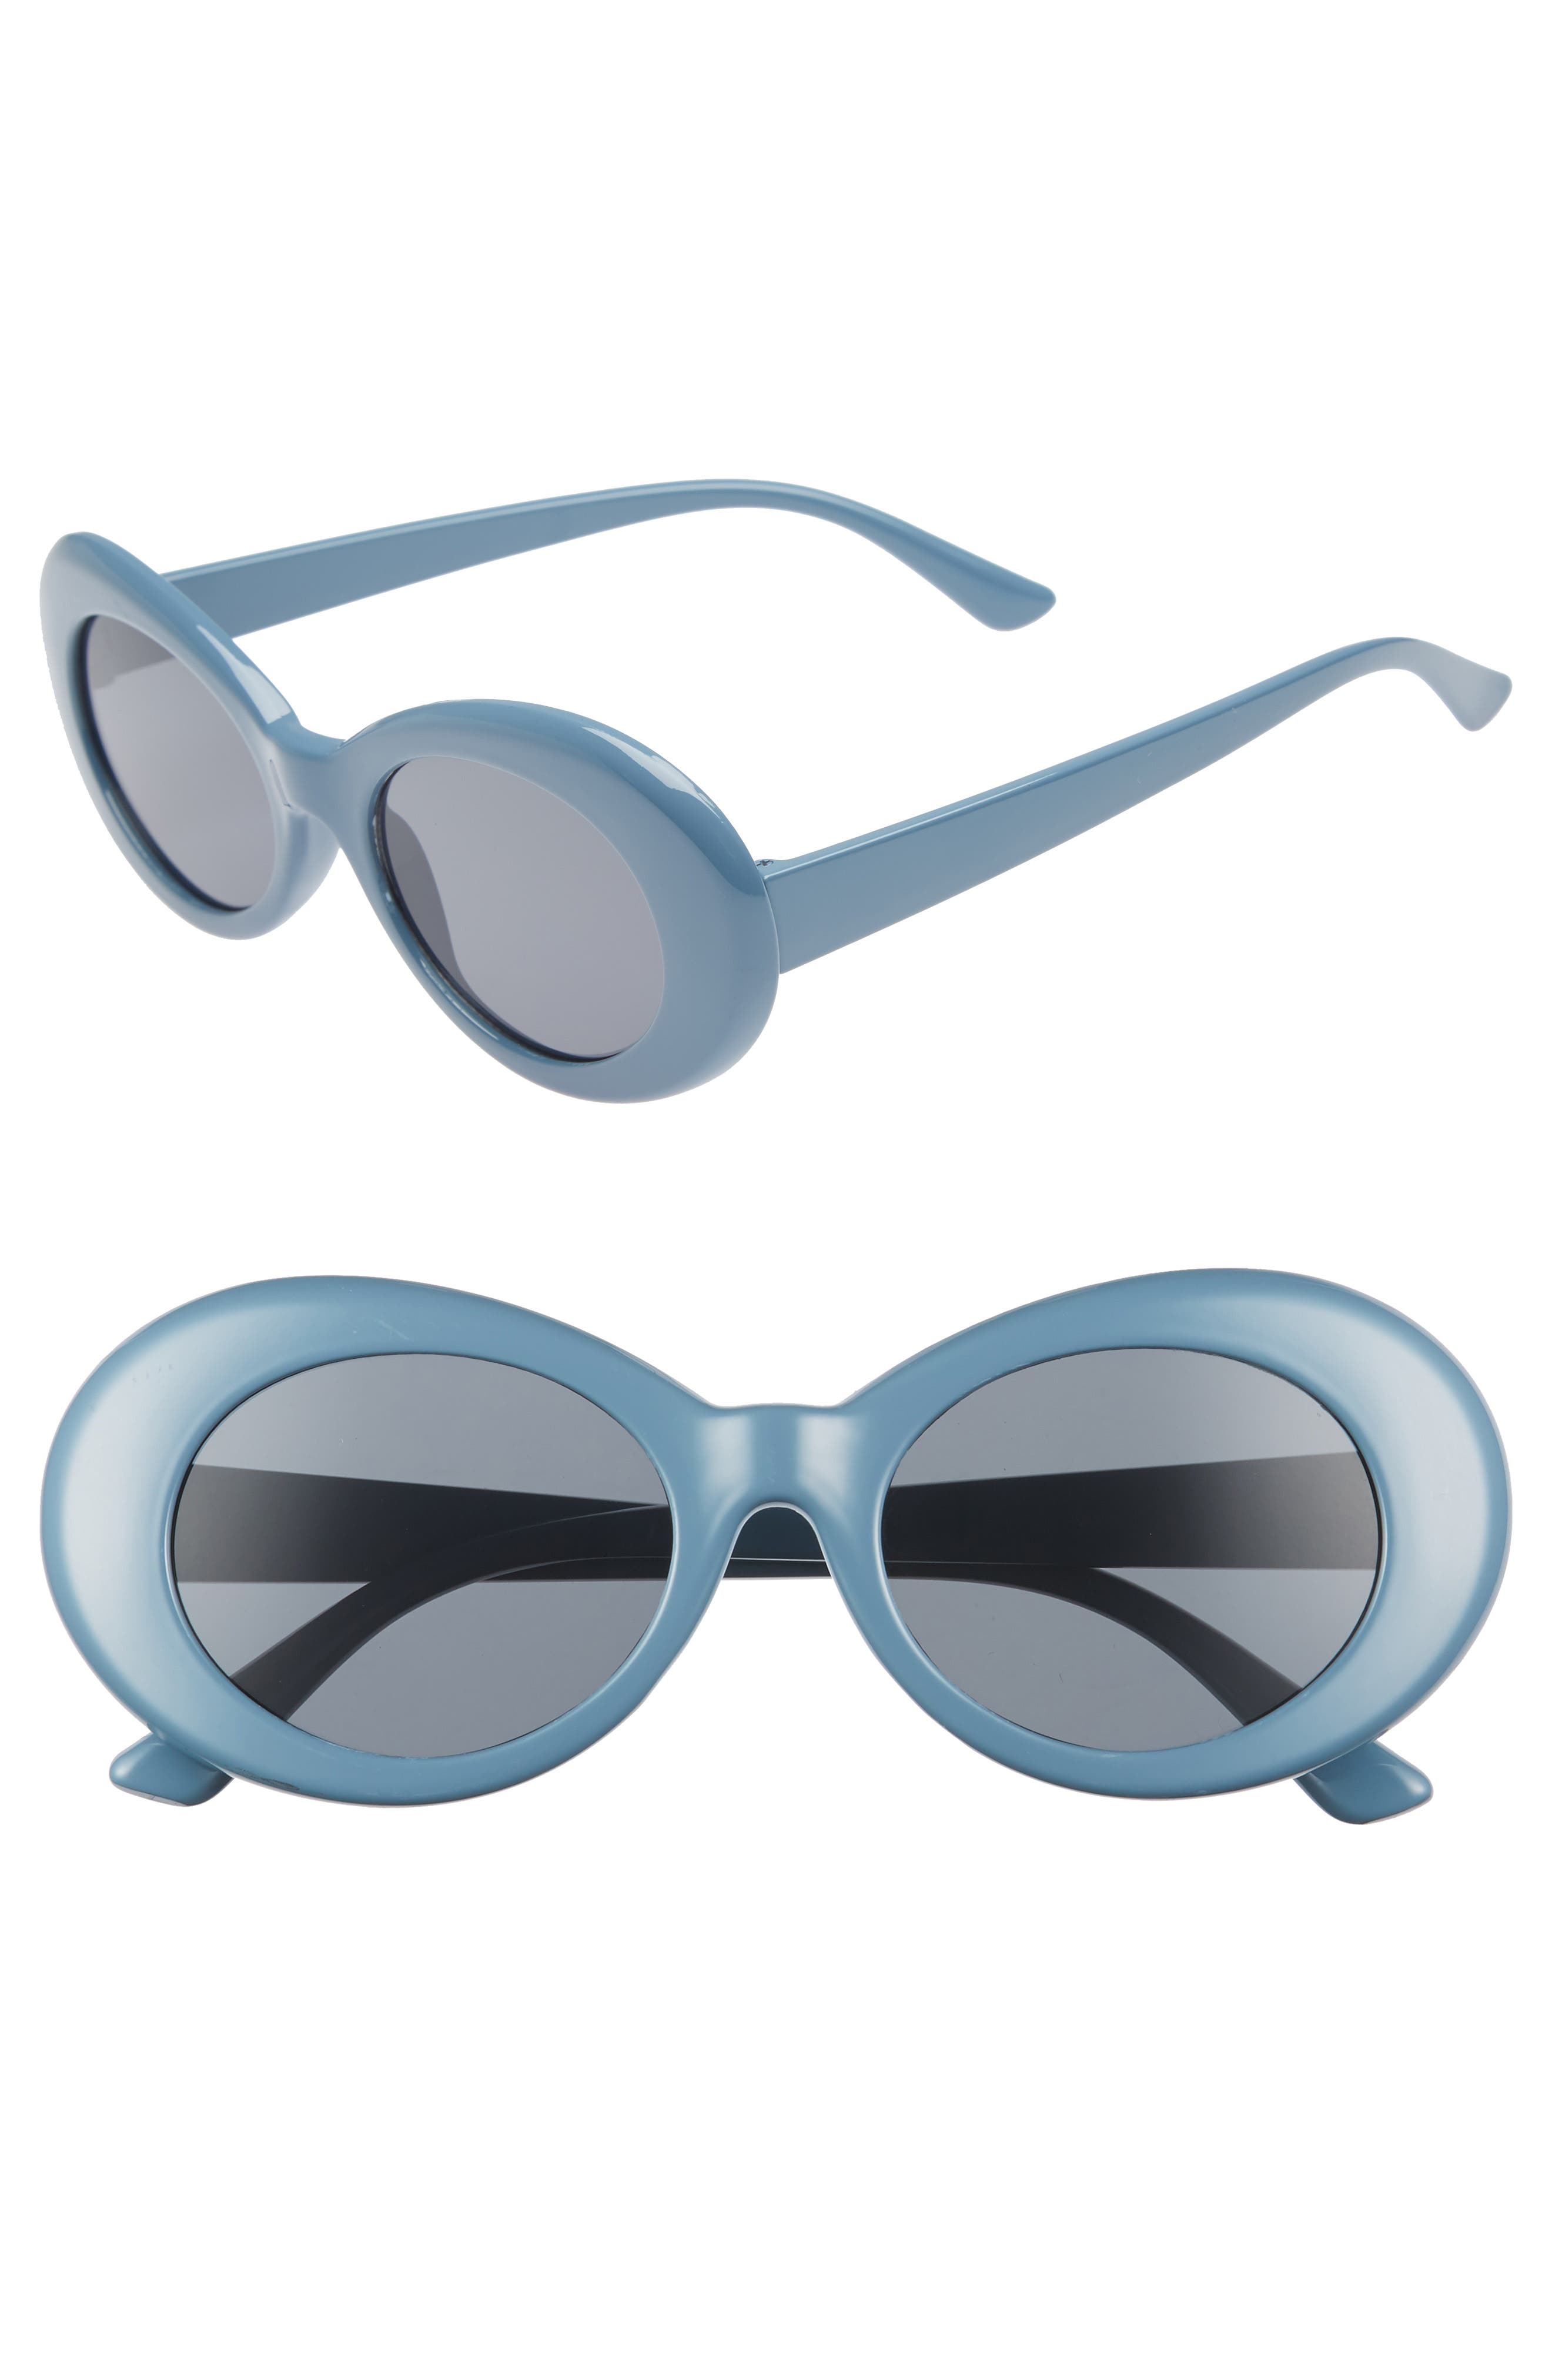 50mm Round Sunglasses,                         Main,                         color, MARINE BLUE